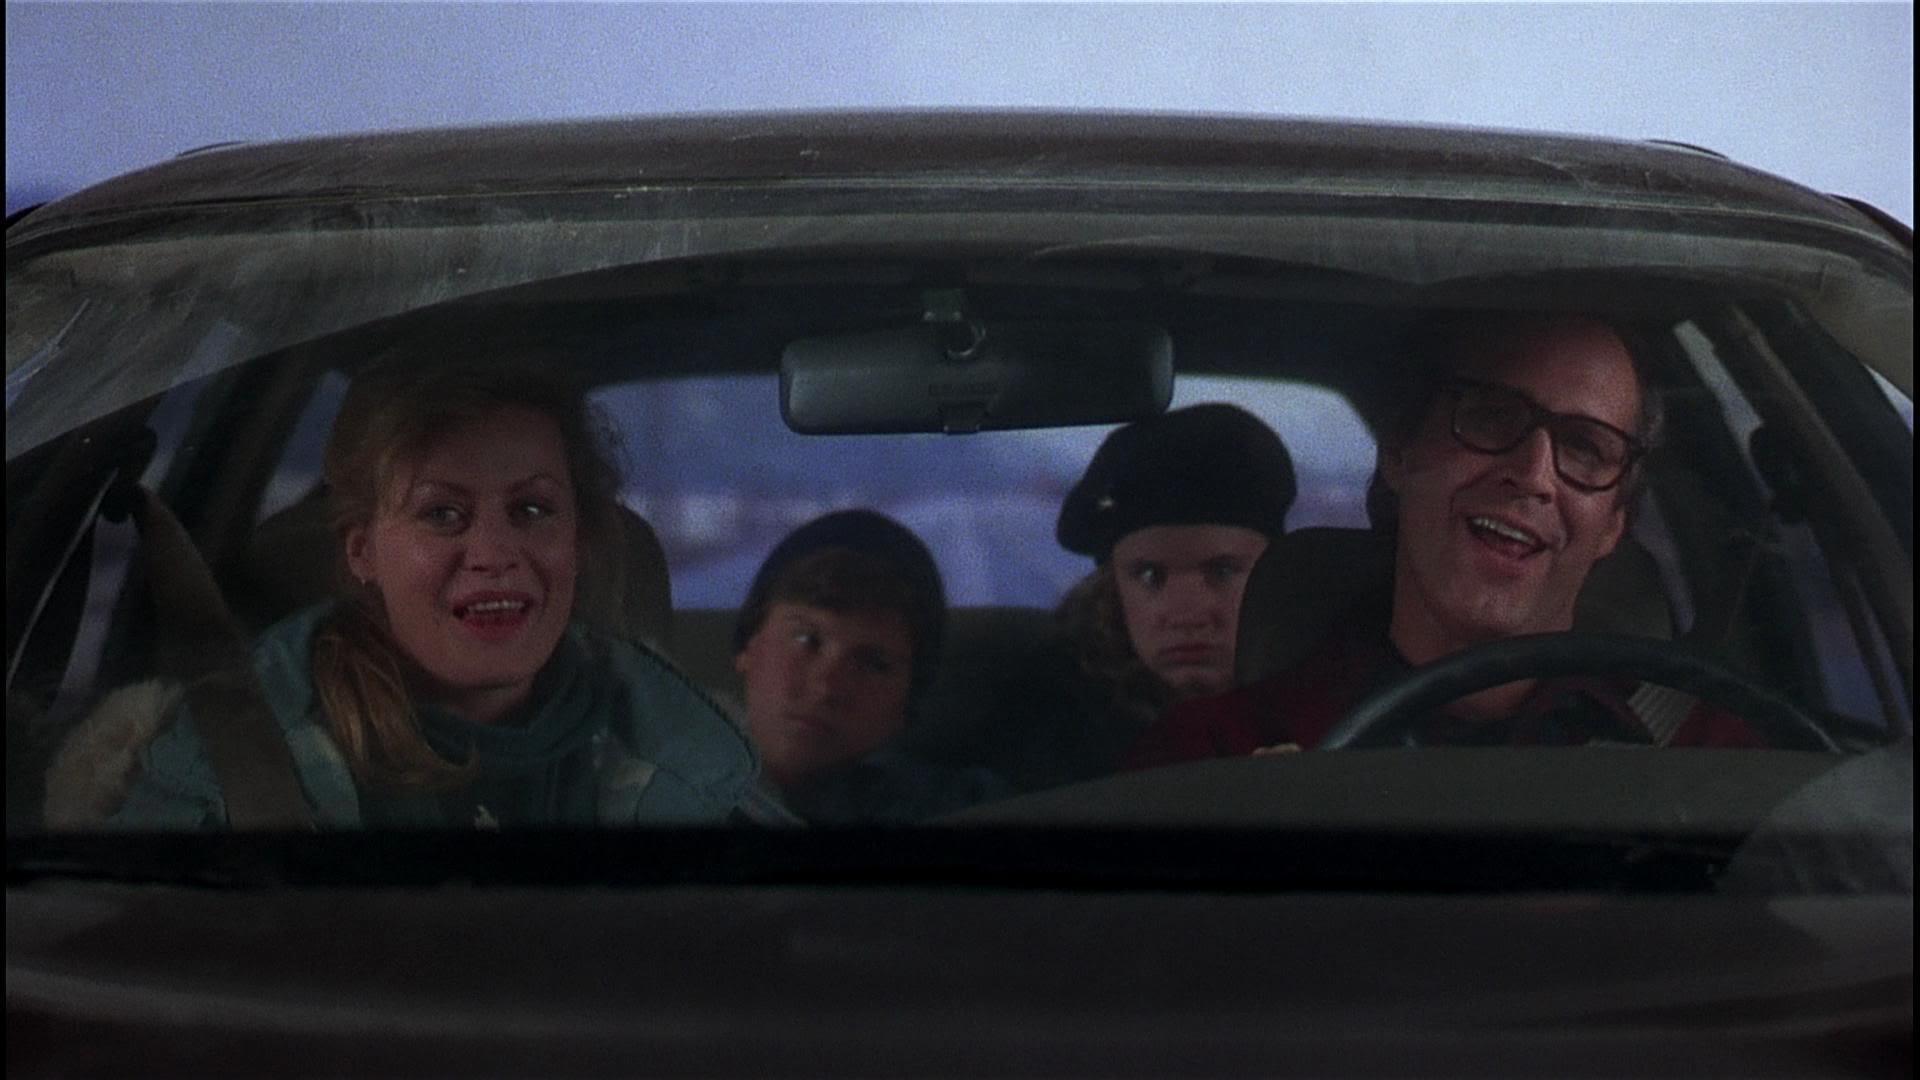 """National Lampoon's Christmas Vacation"" (Jeremiah S. Chechnik, 1989)"